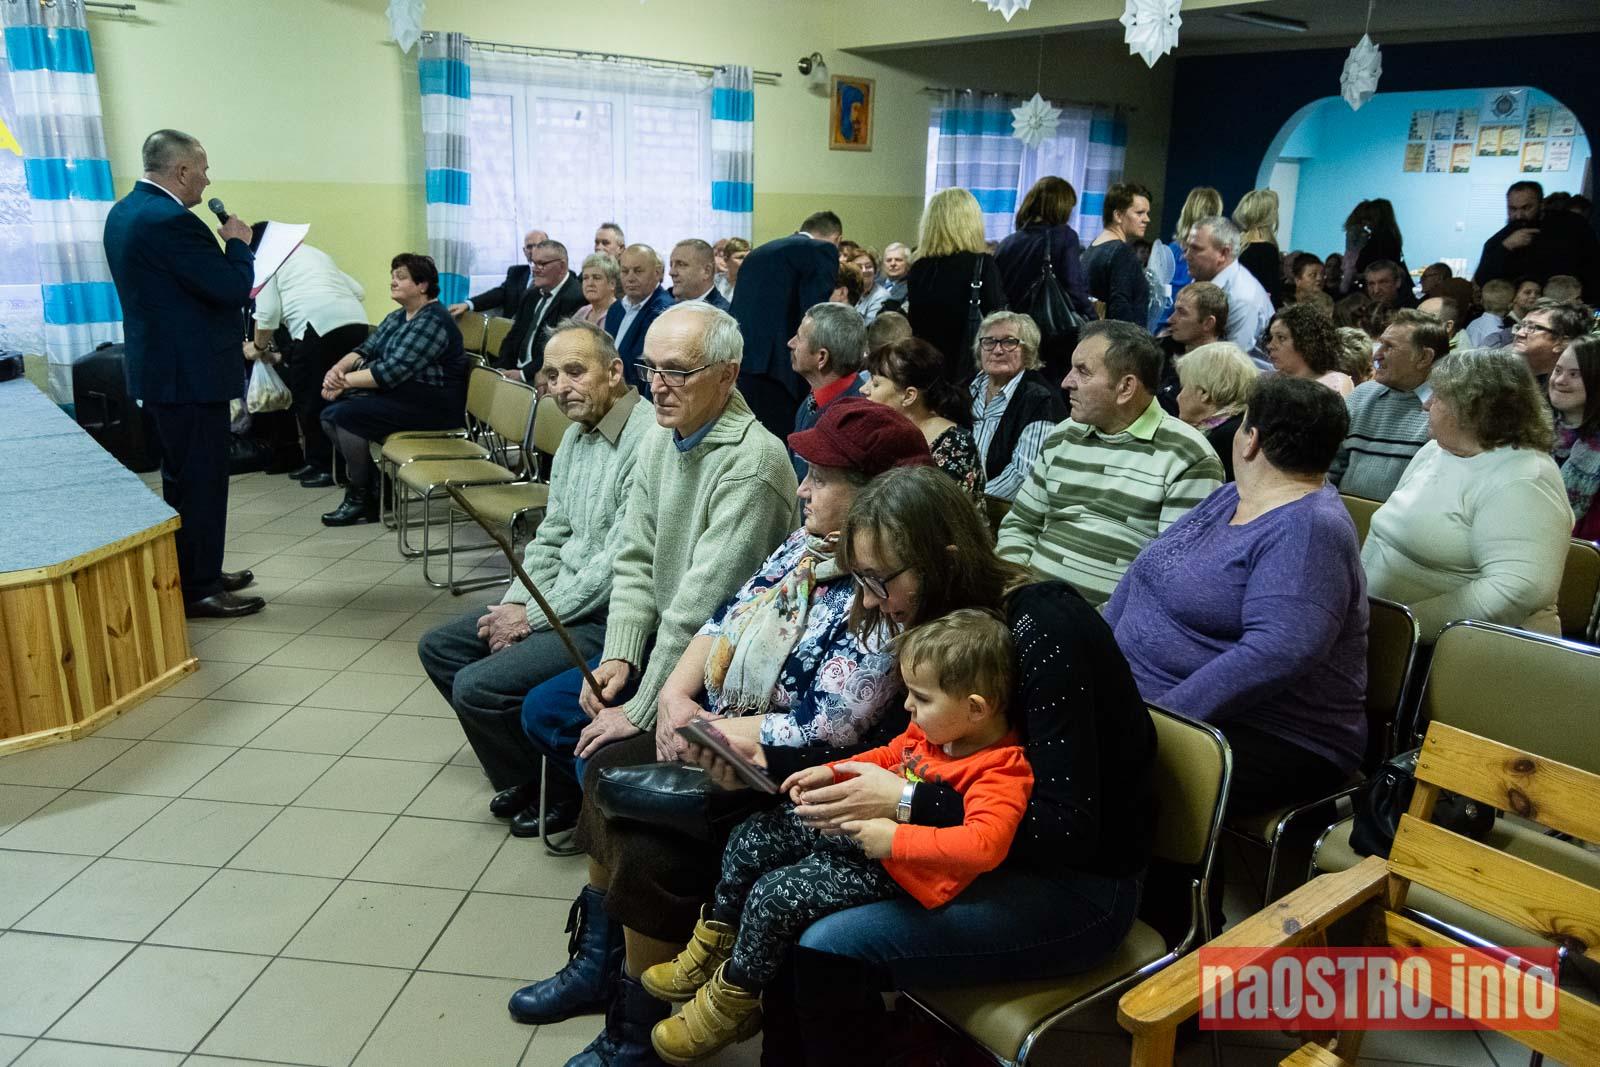 NaOSTRO Zbrucz Ukraina-10022